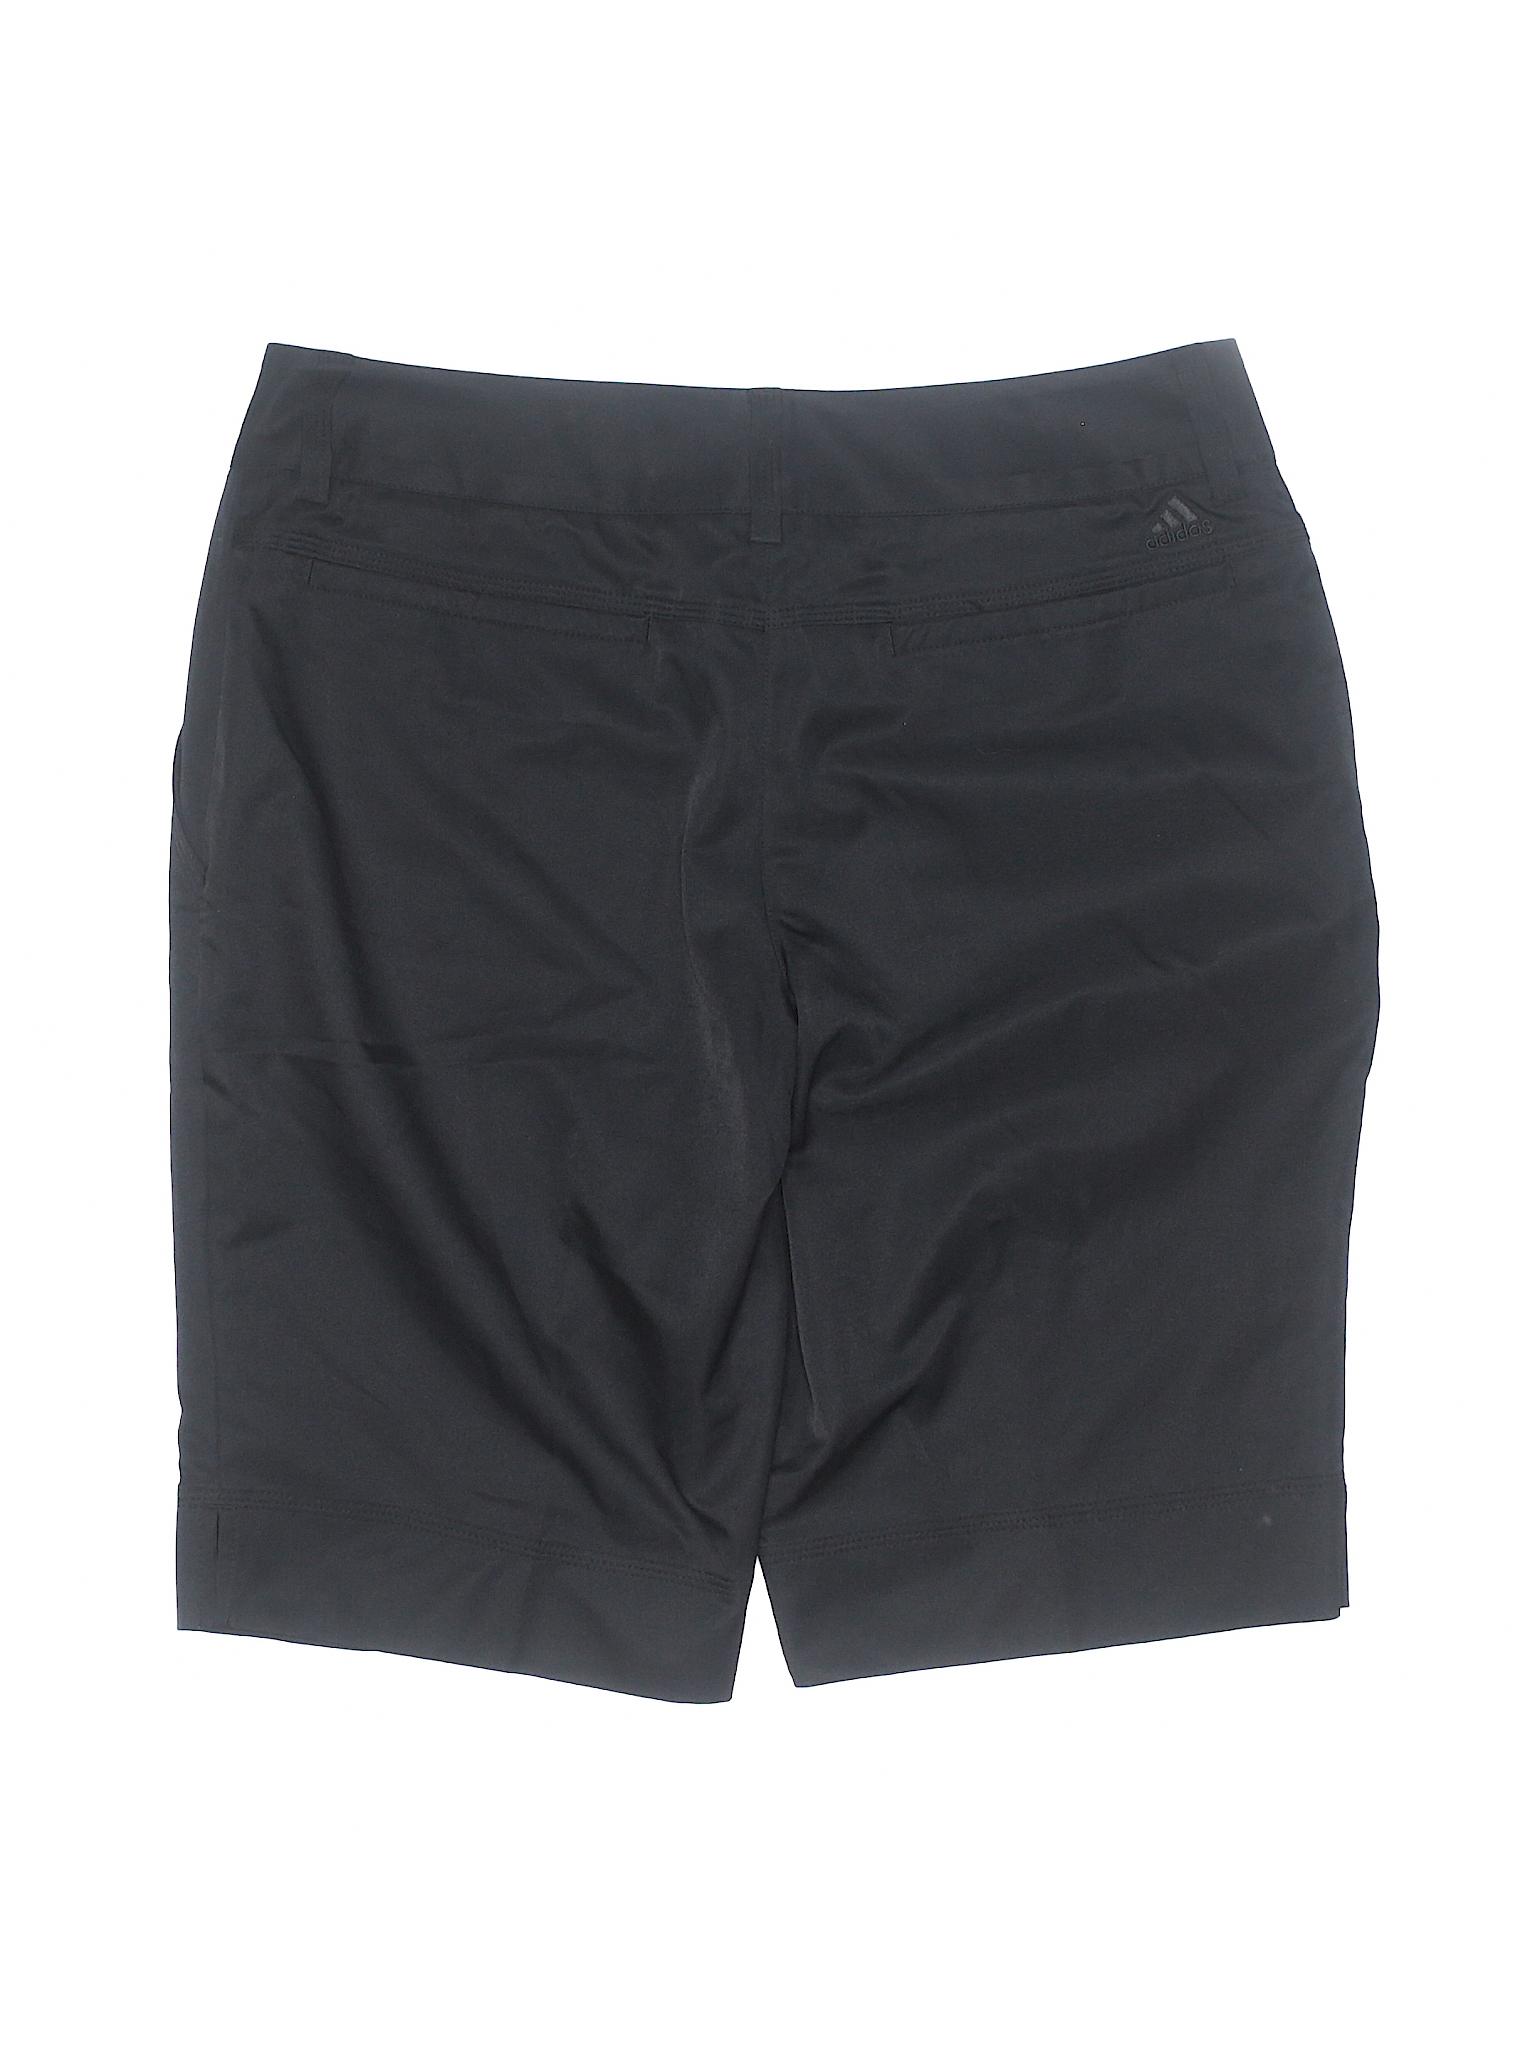 Boutique Adidas Athletic Boutique Adidas Shorts 4pP1Fwqxp